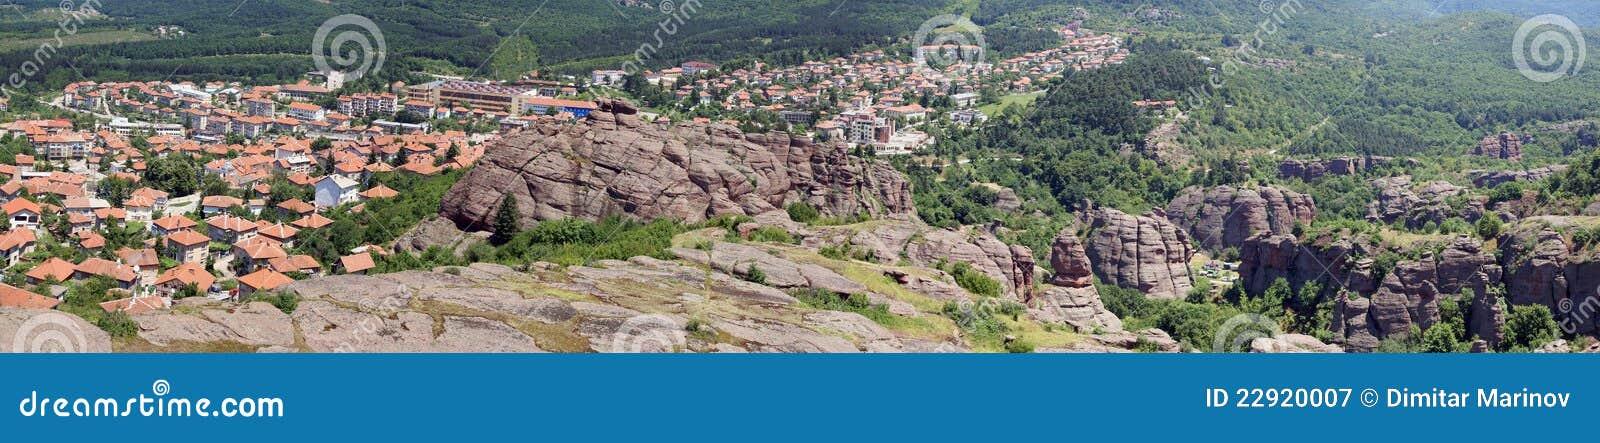 Belogradchikbulgaria town